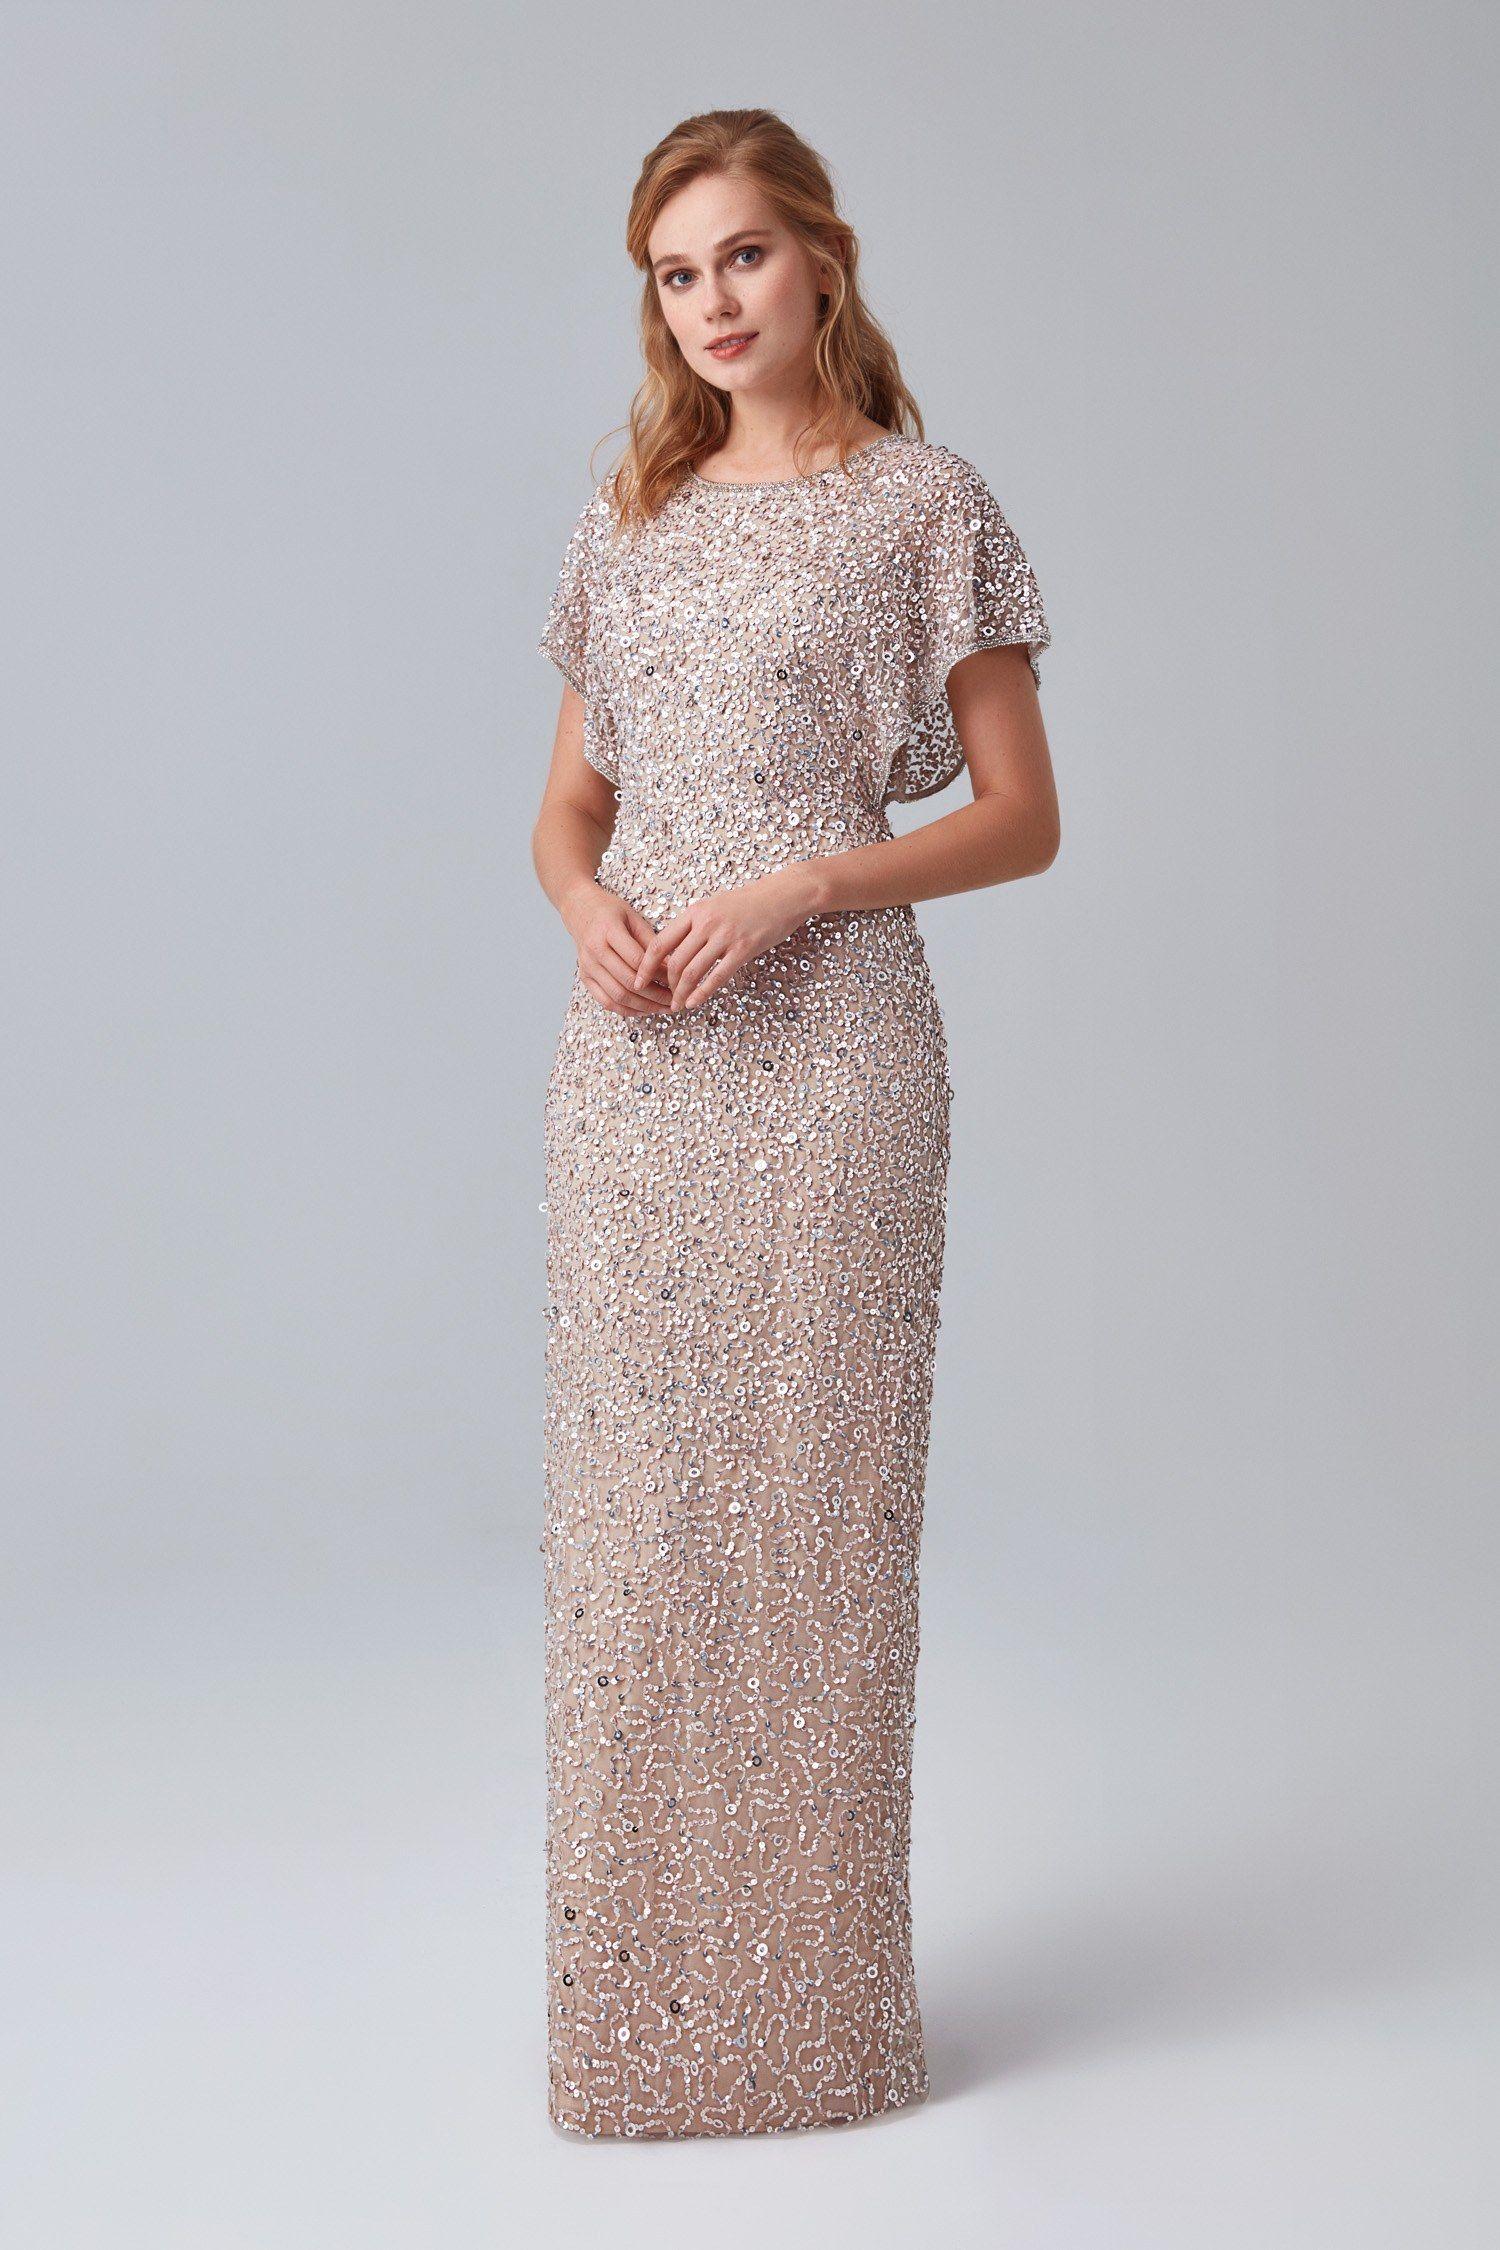 Gumus Payetli Ten Rengi Kisa Kollu Pullu Uzun Anne Abiyesi Elbise Elbise Modelleri The Dress